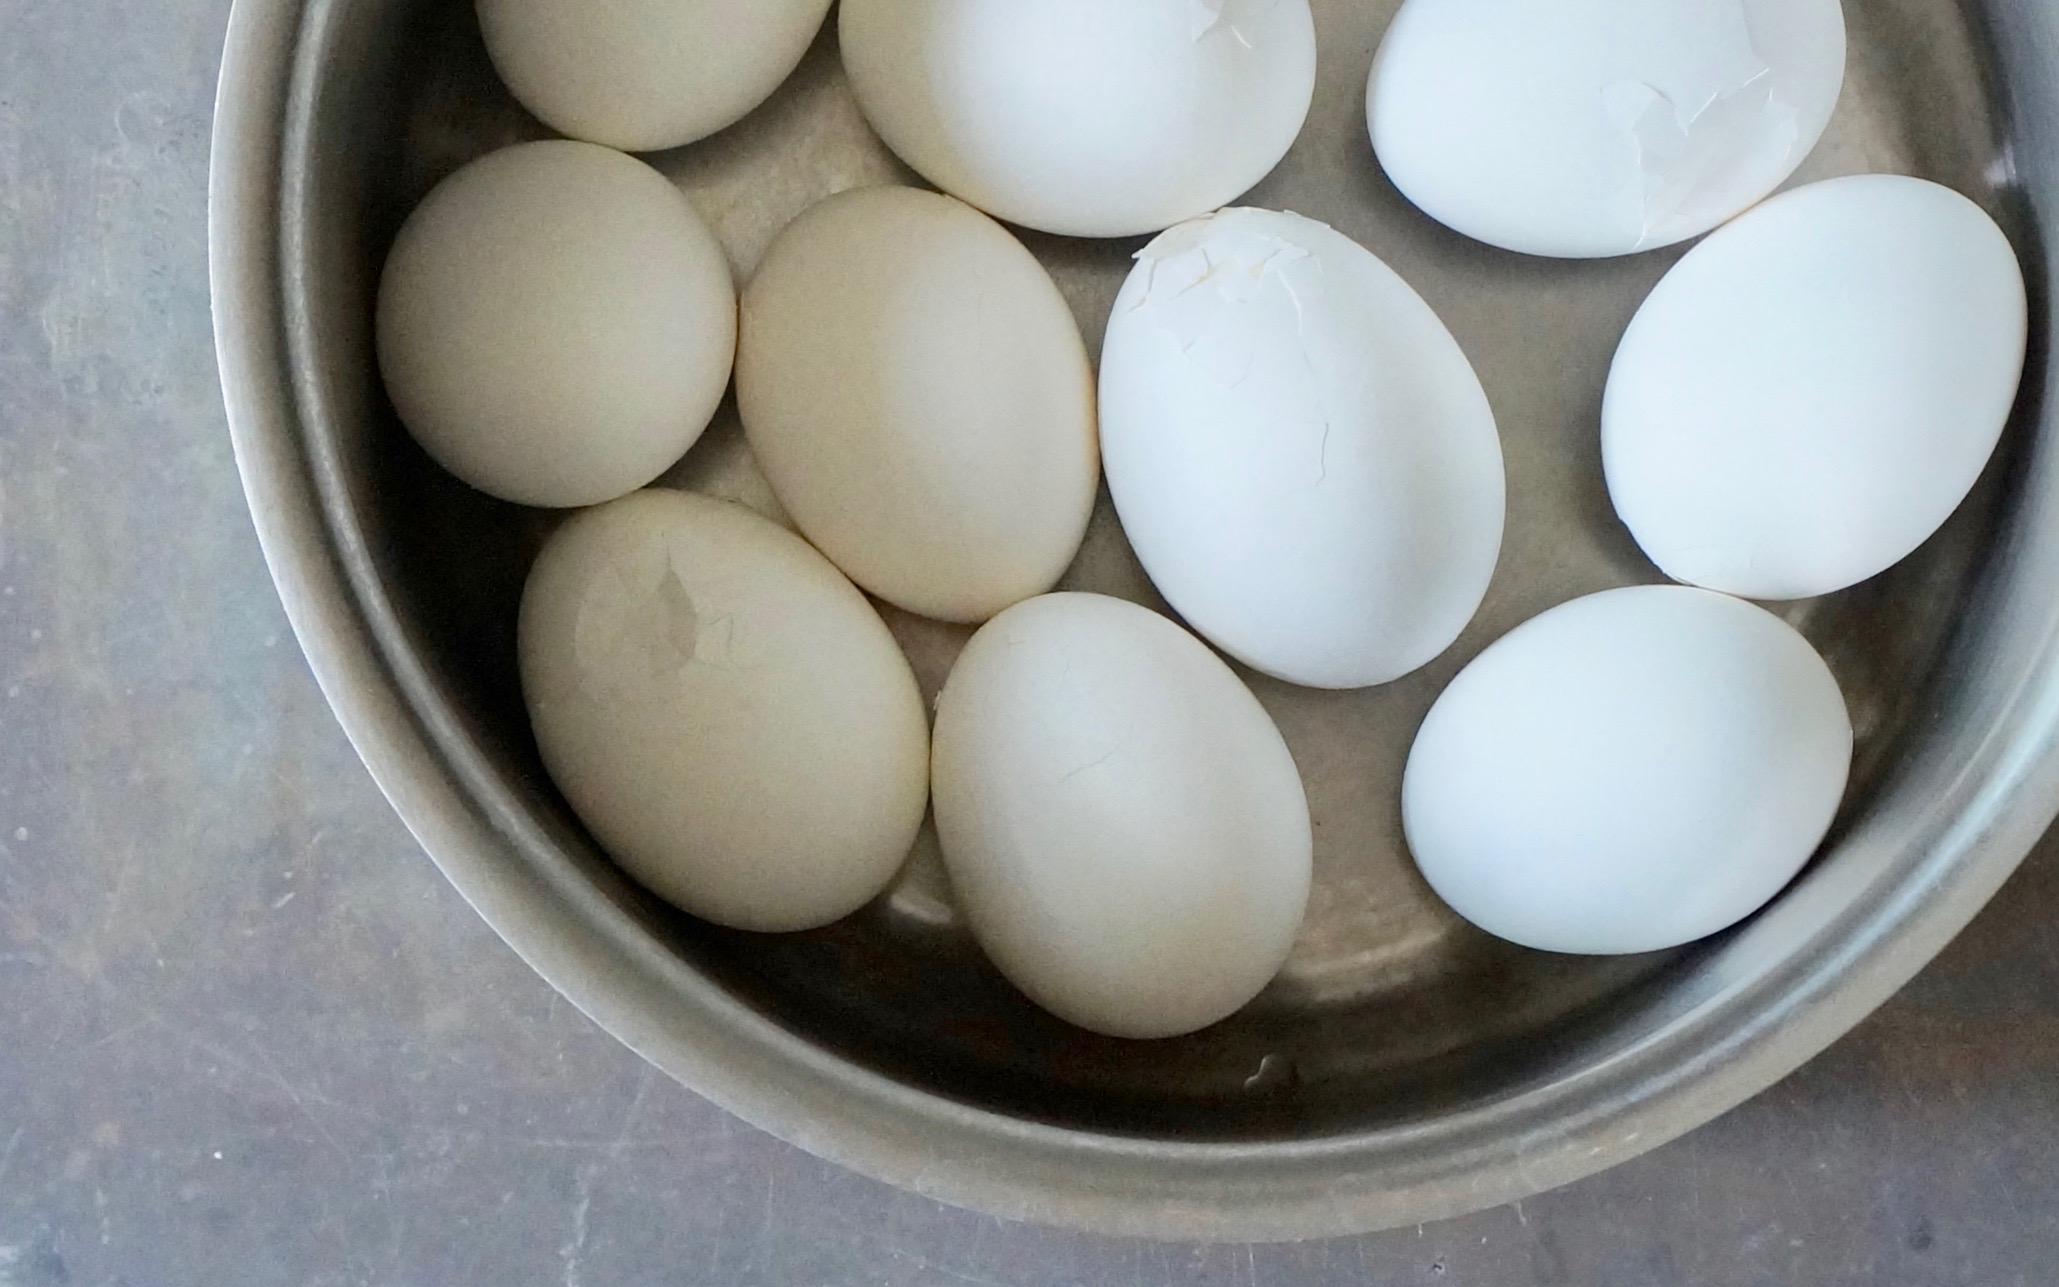 How To Boil Eggs Rebecca Gordon Publisher Buttermilk Lipstick Culinary Entertaining Techniques Southern Hostess RebeccaGordon Pastry Chef Birmingham Alabama